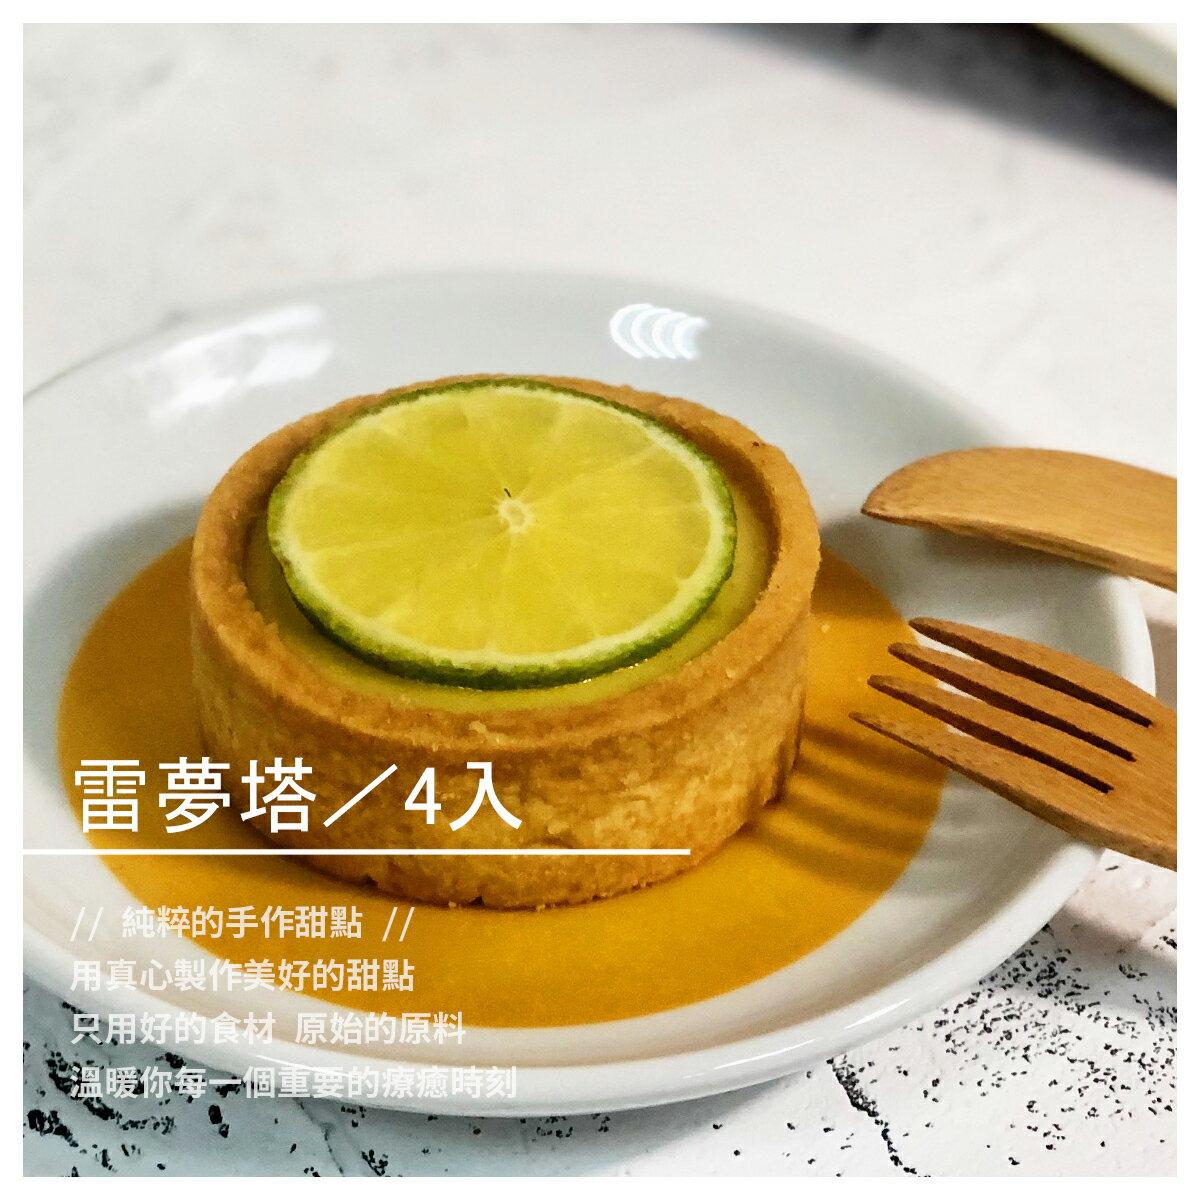 【M Bakery 手作菓子】雷夢塔/4入